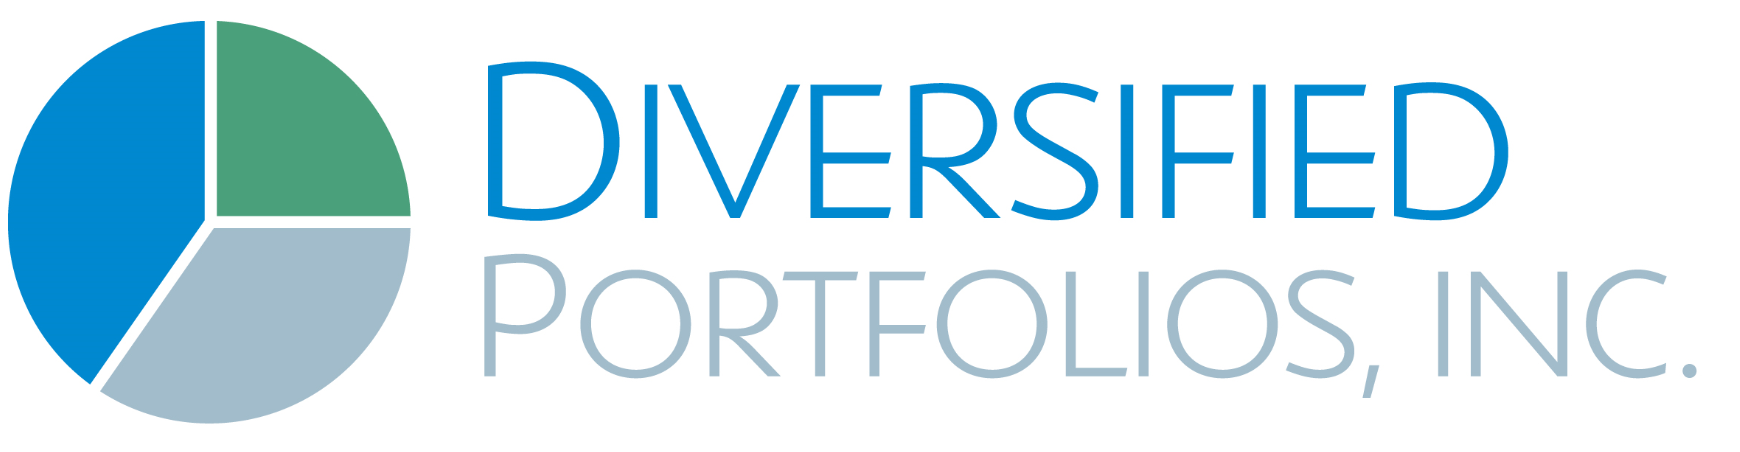 Diversified Portfolios